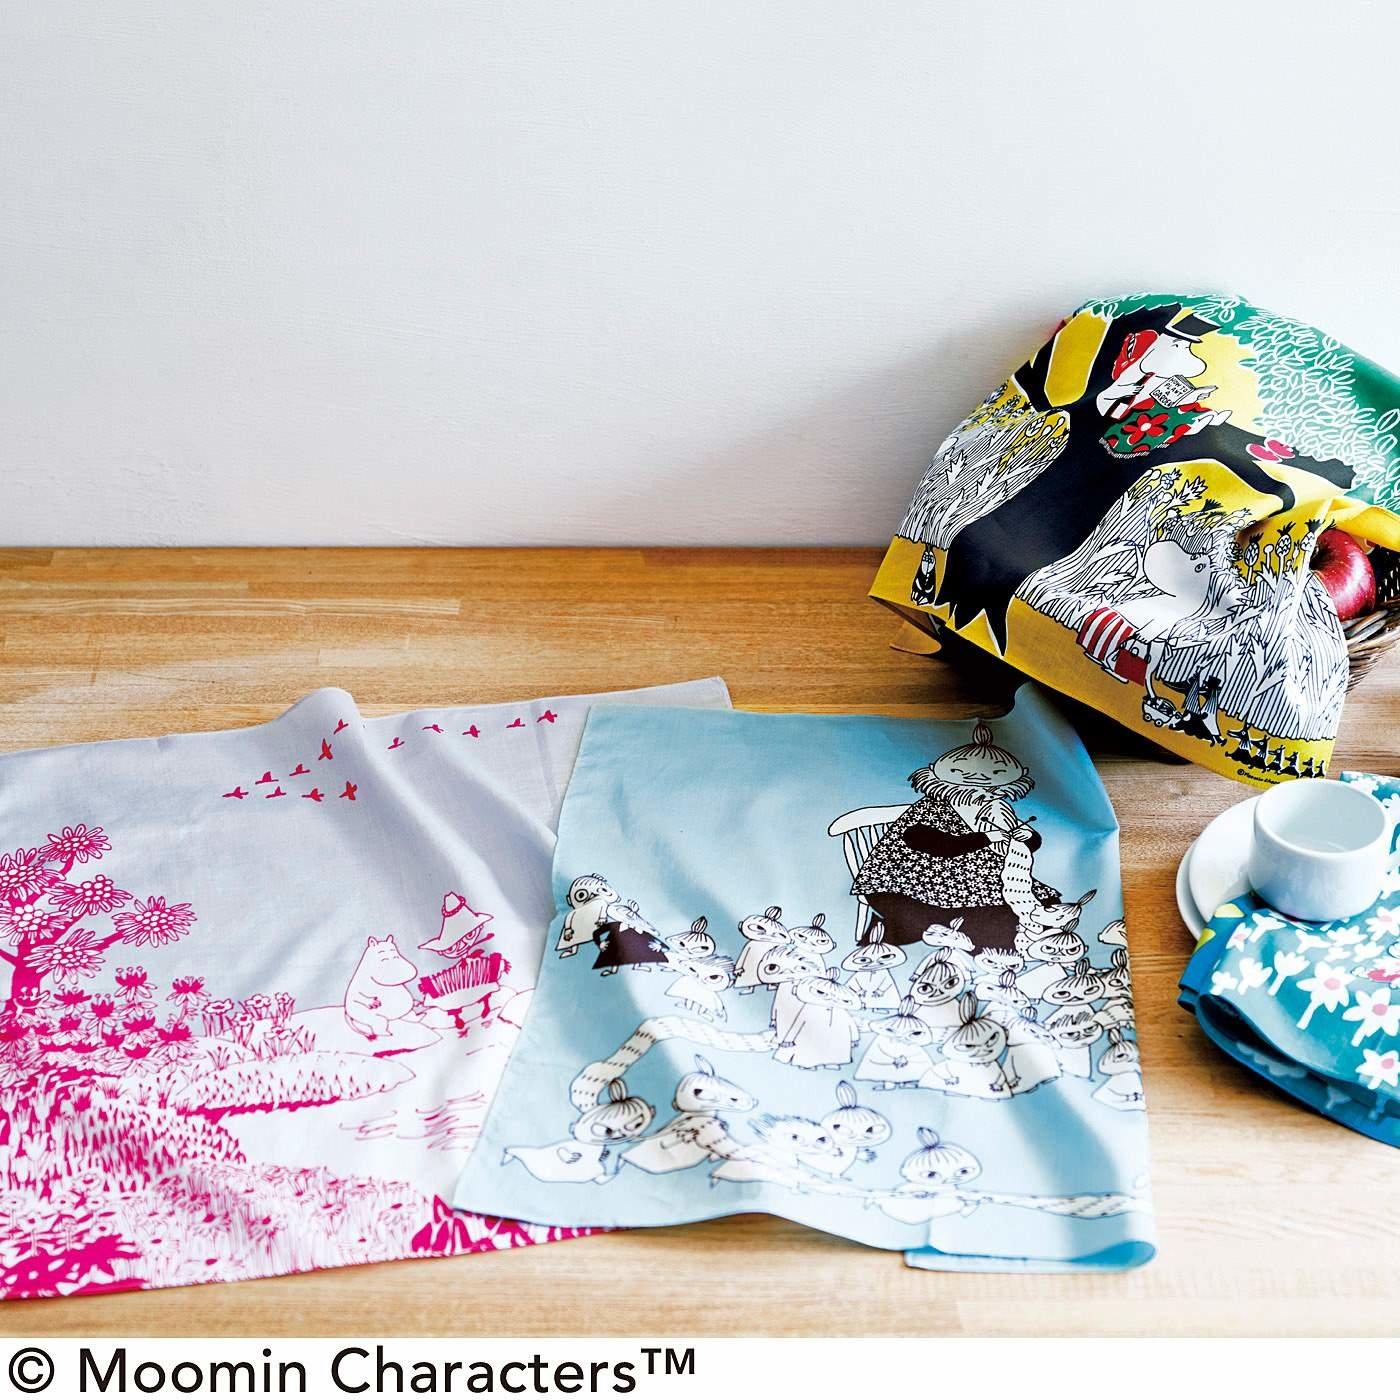 50×50cmの布に紡ぎだされる鈴木マサルさんの世界 MOOMIN TRIBUTE WORKS ハンカチの会